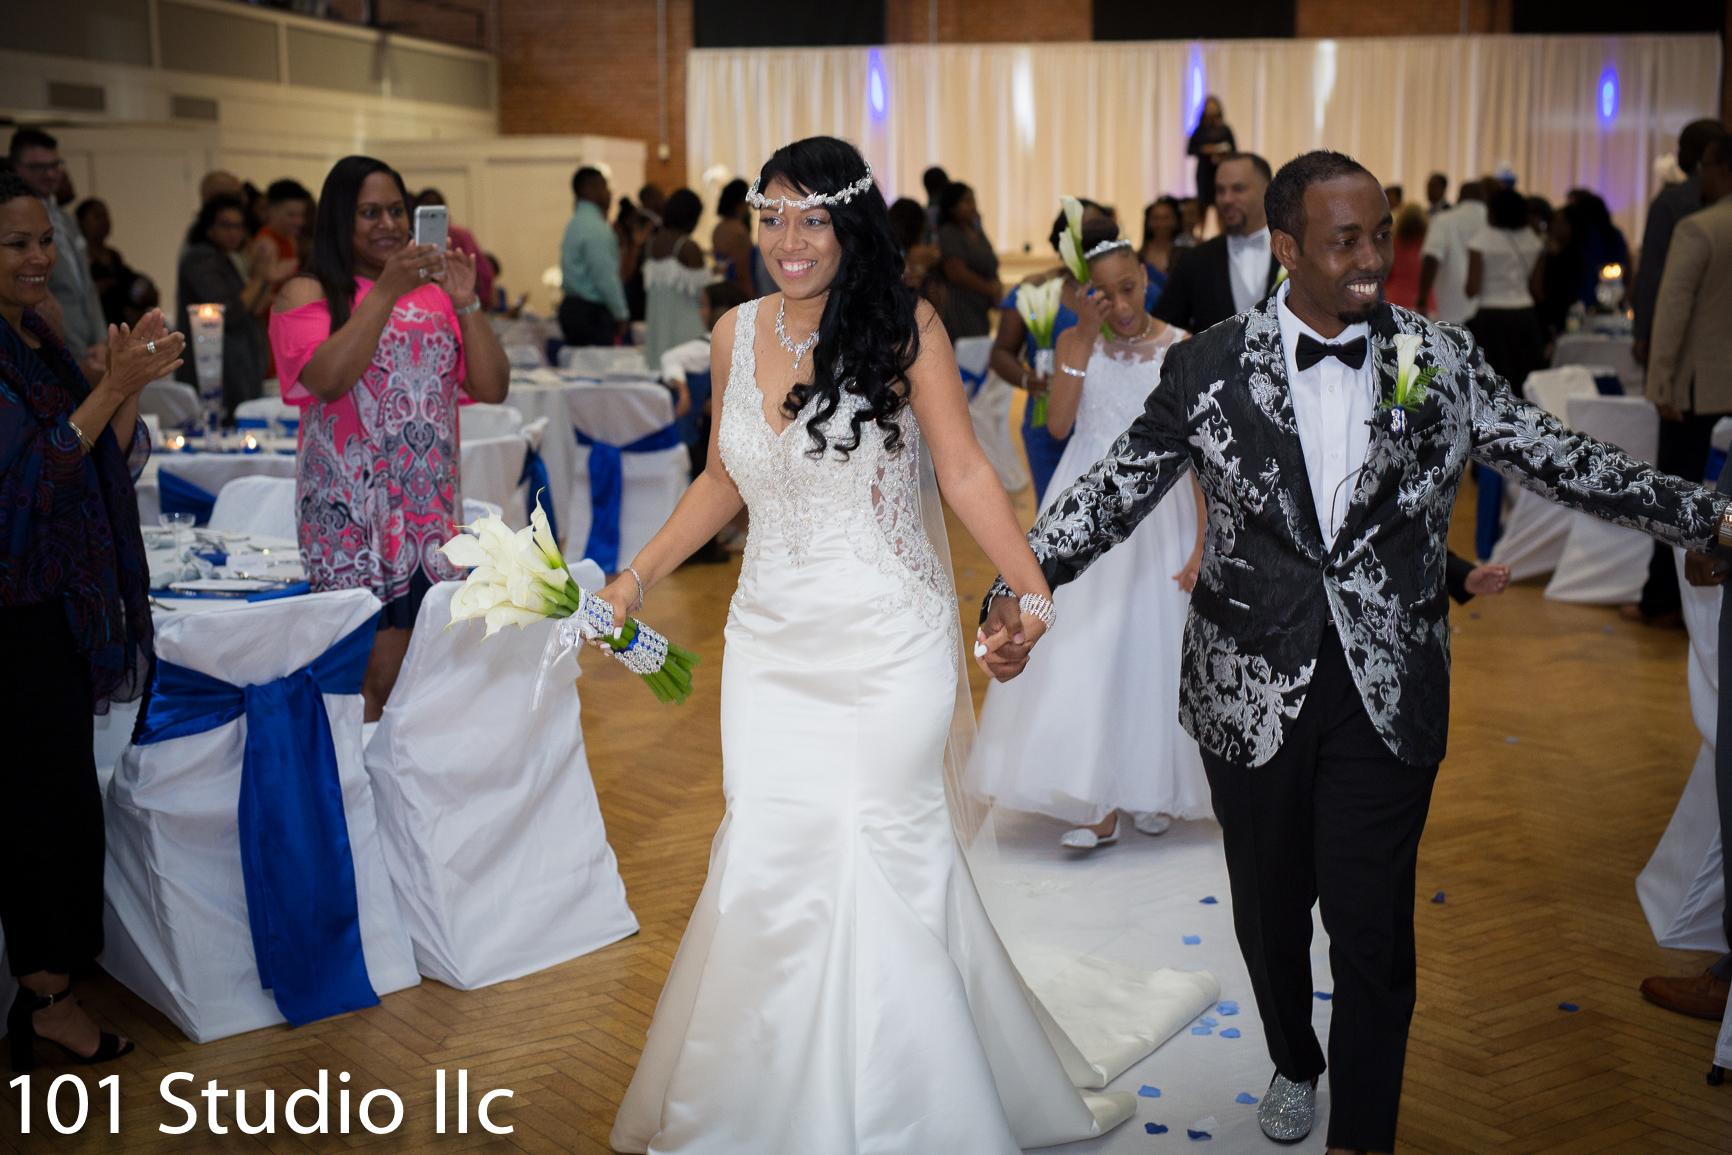 Raleigh  wedding photographer - 101 Studio llc -9.jpg